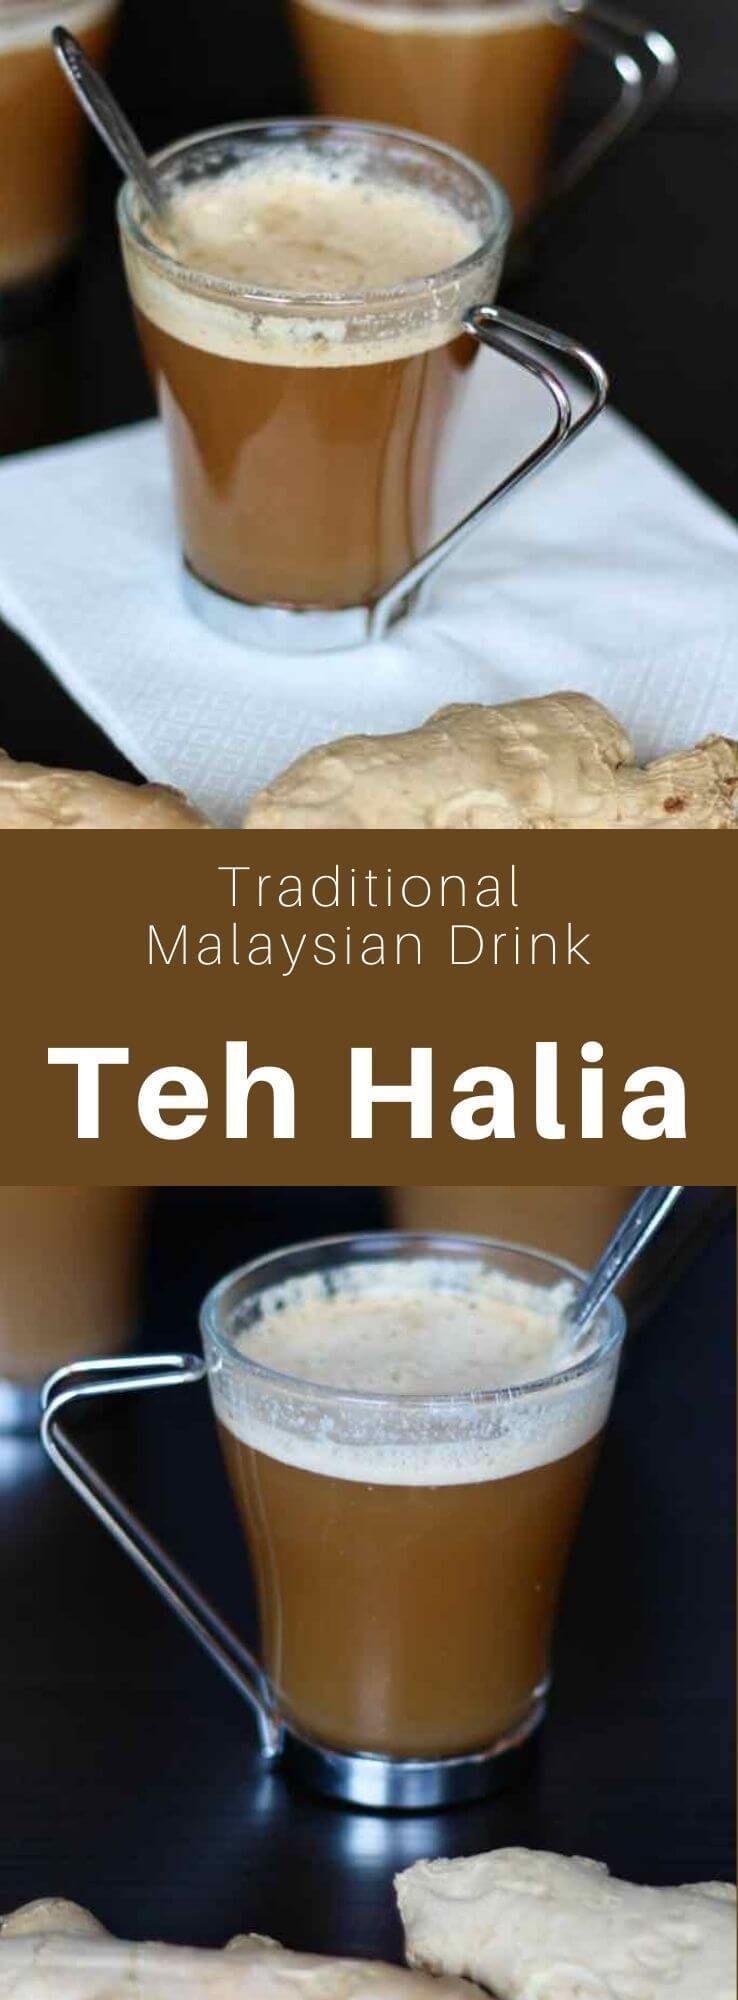 Malaysia Teh Halia In 2020 Malaysian Cuisine Malaysian Food Recipes